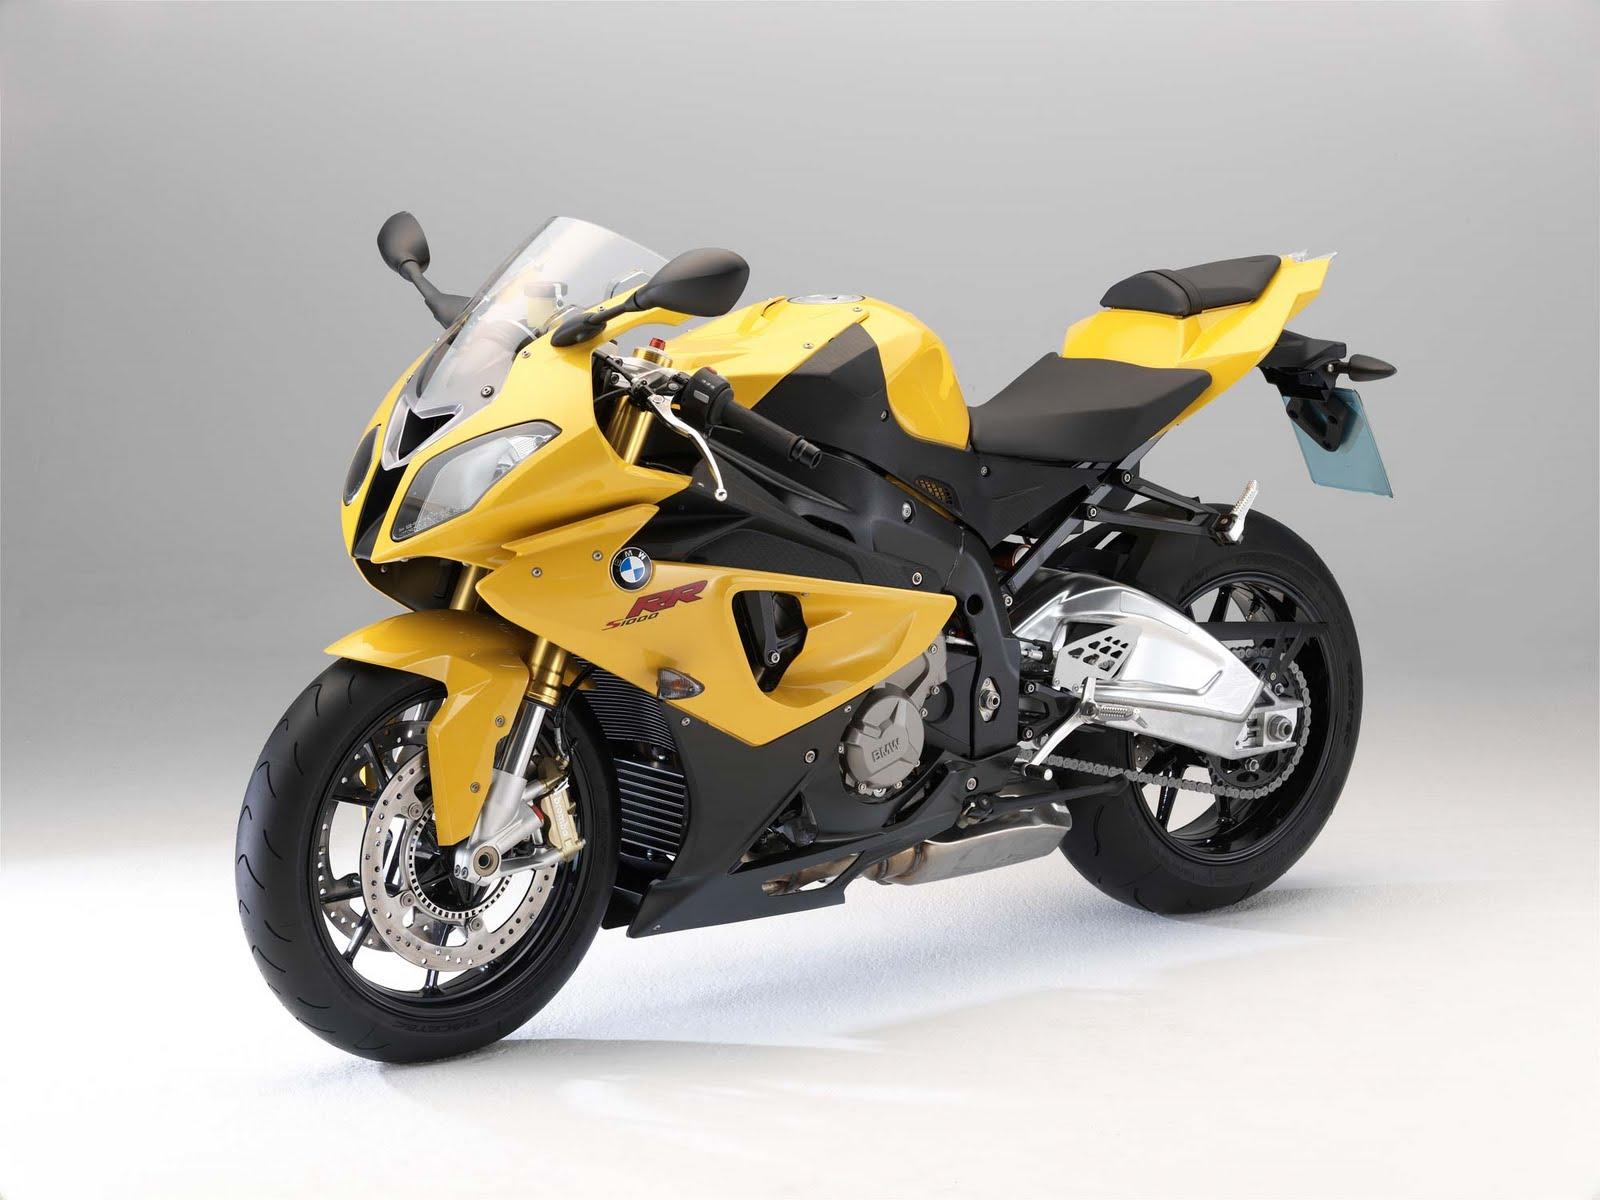 BMW Motorcycles SRR